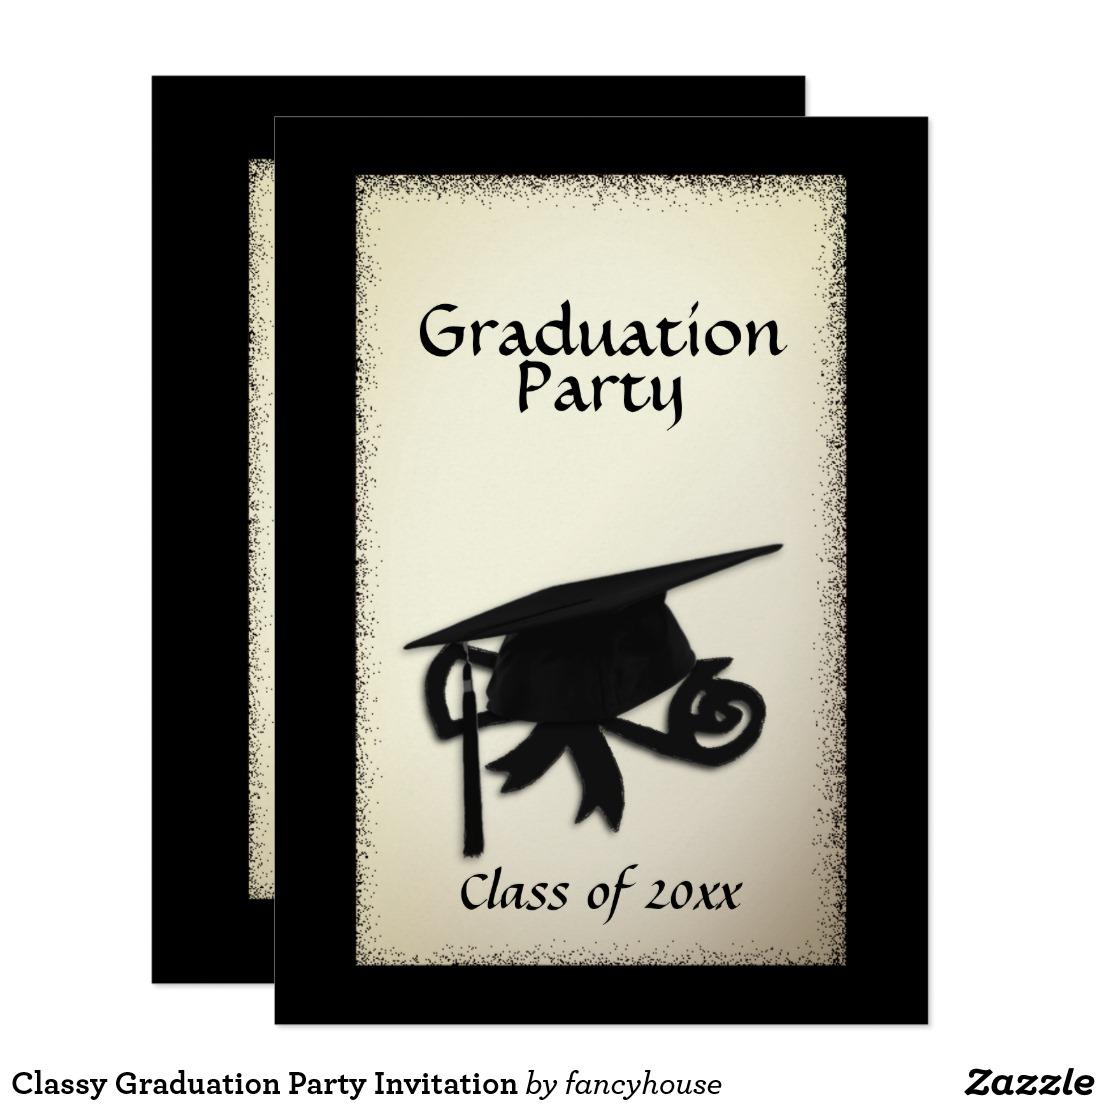 Classy Graduation Party Invitation